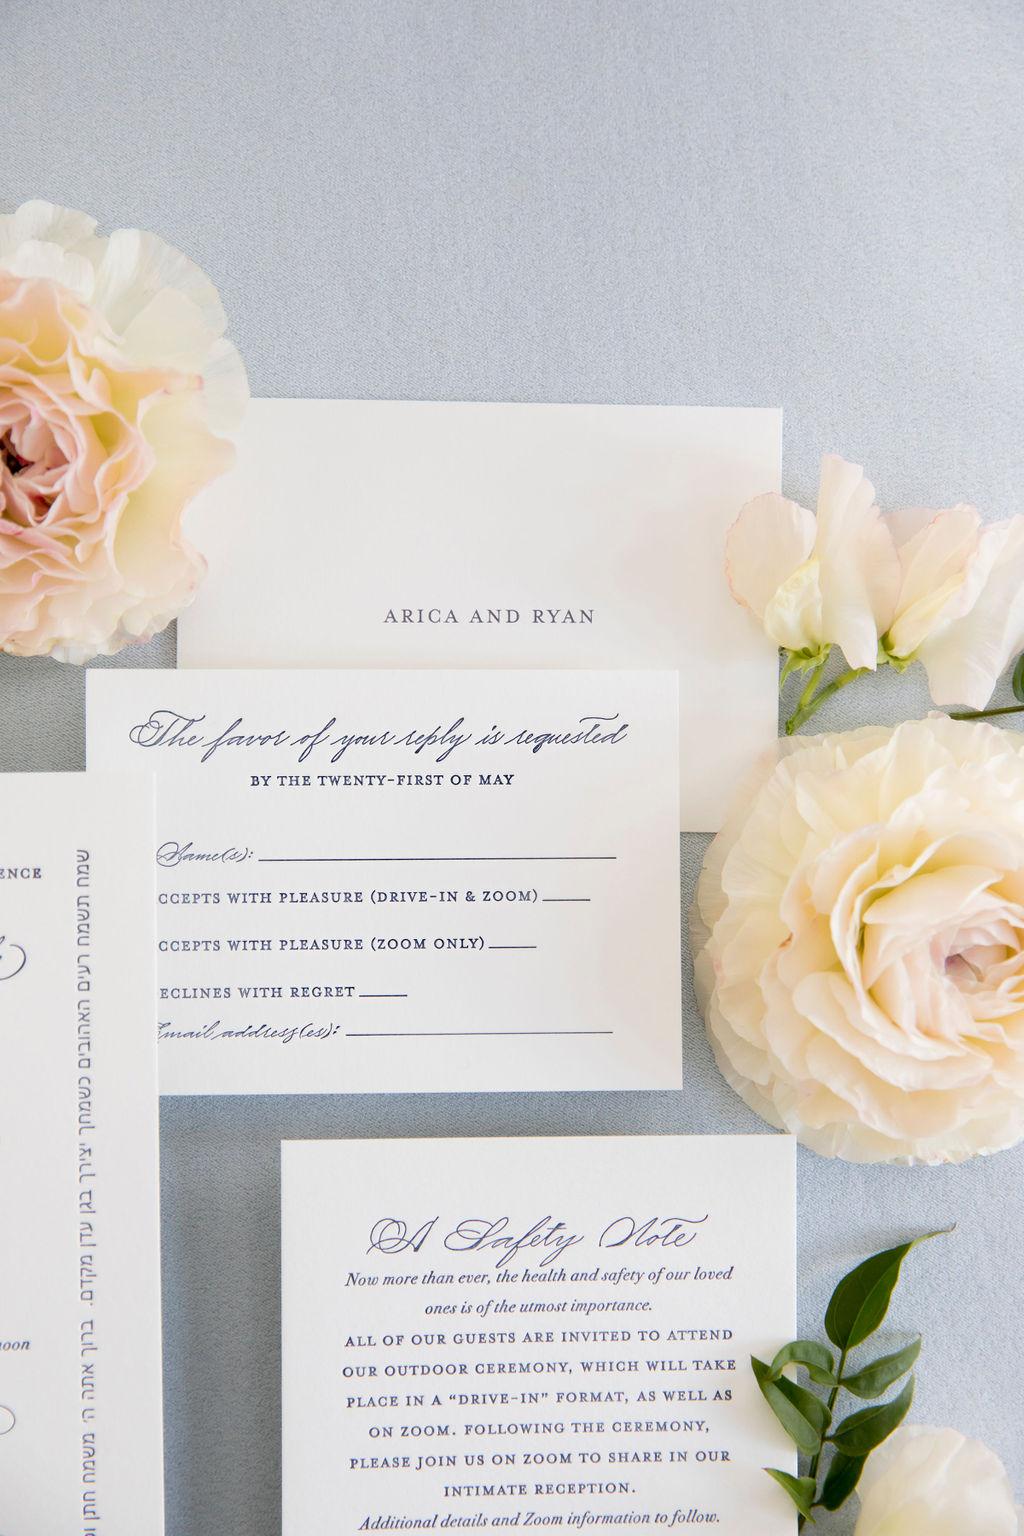 navy letterpress reply card - Leah E. Moss Designs